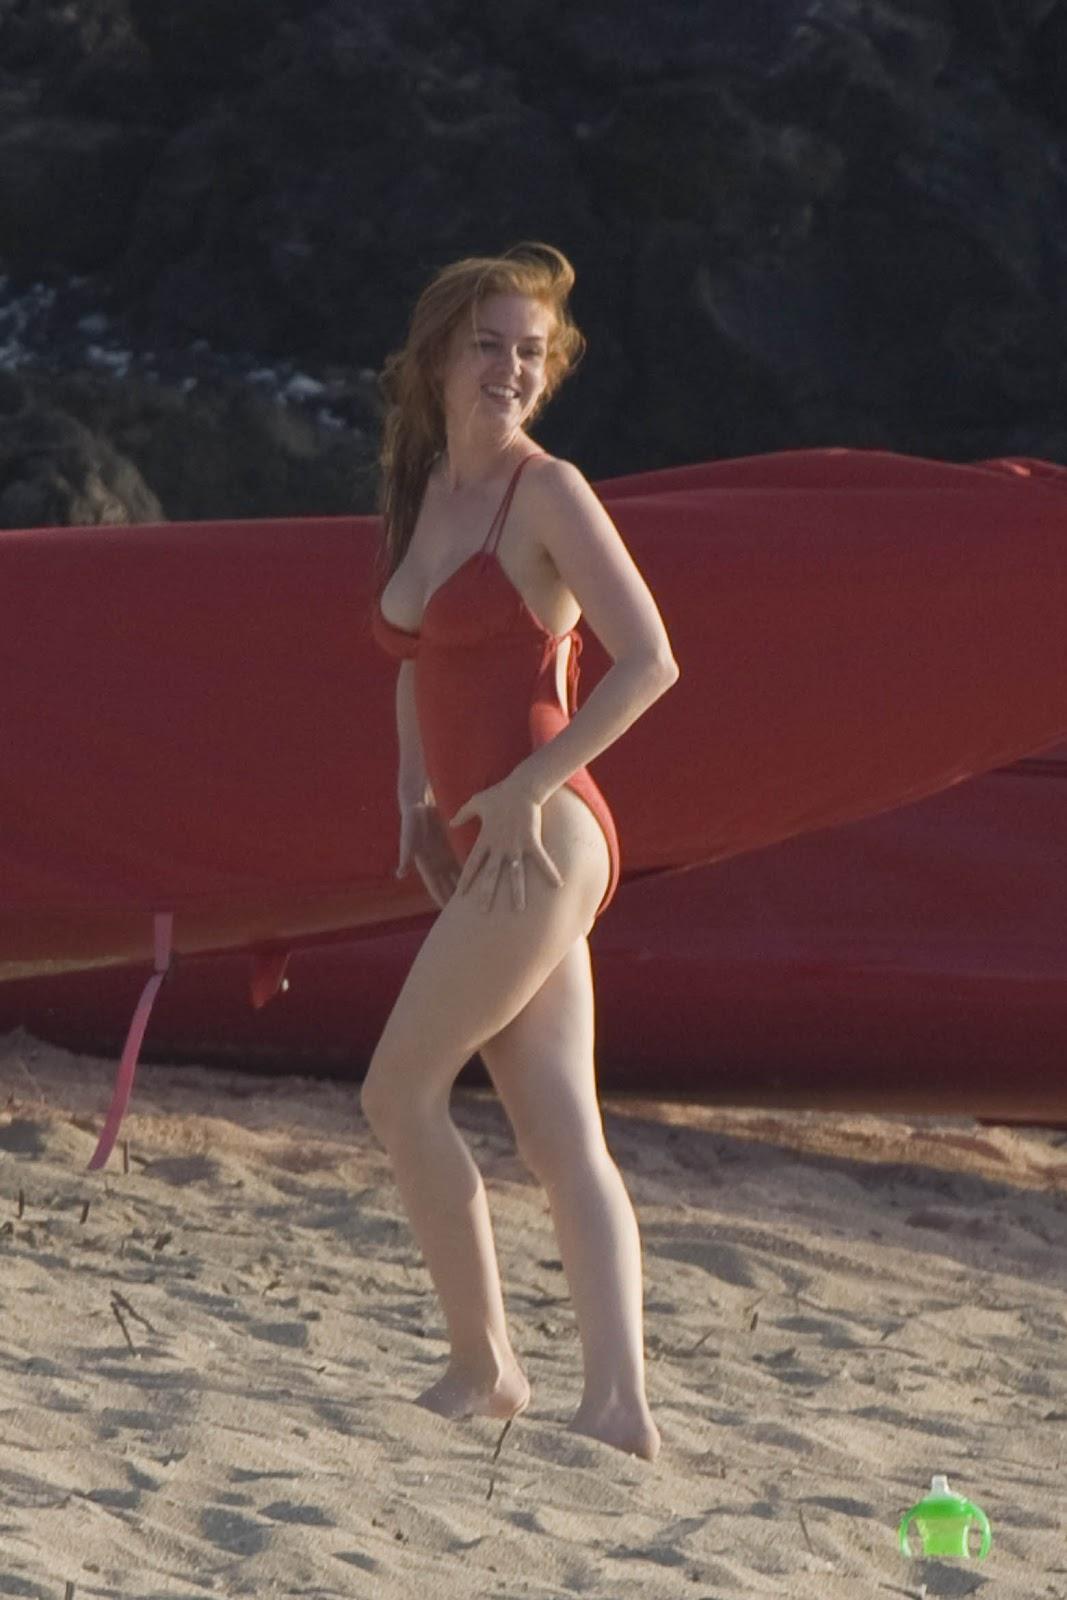 http://3.bp.blogspot.com/-i4irweL-er0/T8ainV3fQDI/AAAAAAAAGFw/rnOkIbd2WkE/s1600/isla_fis_bikini_4_big.jpg